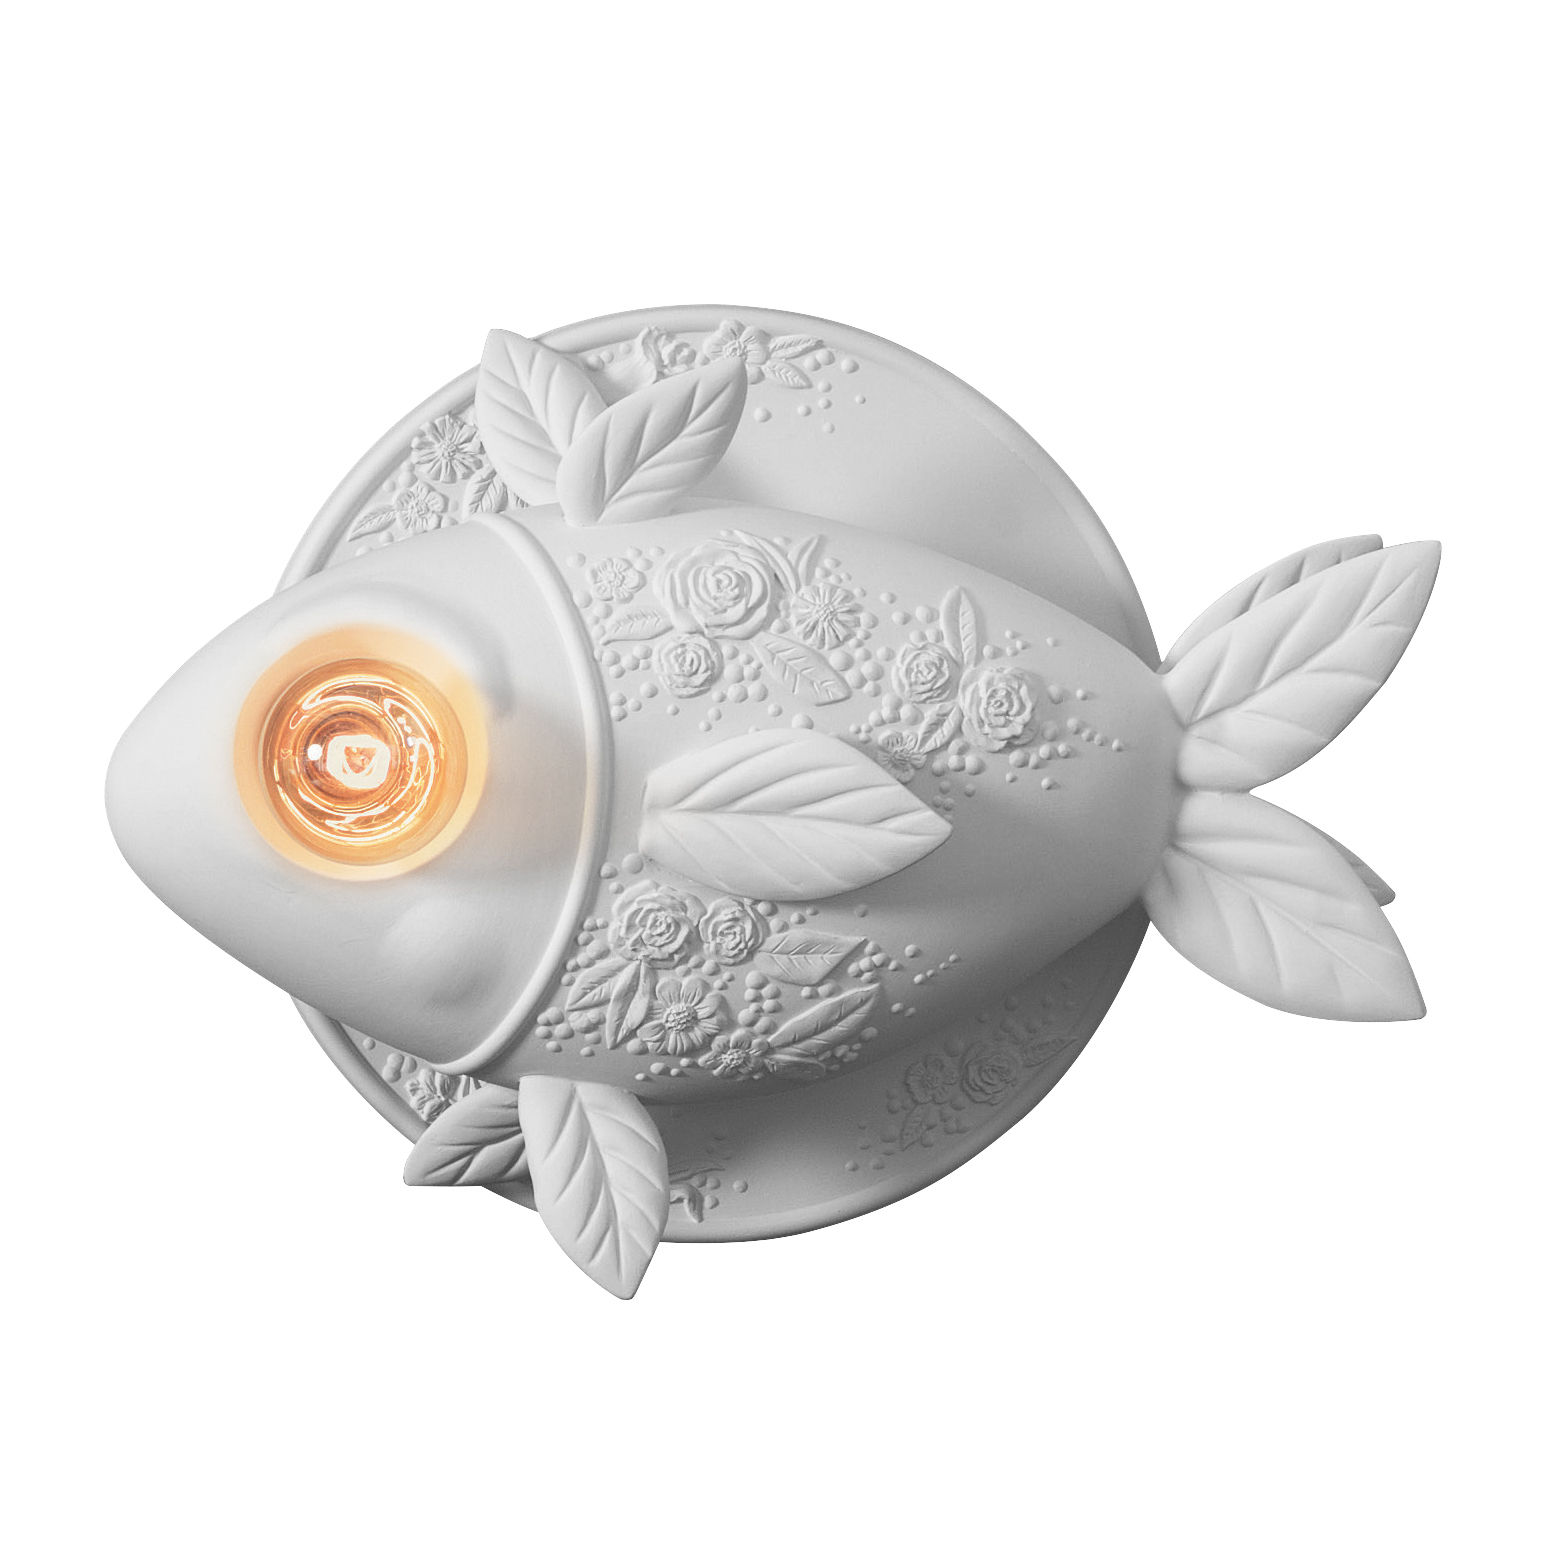 Lighting - Wall Lights - Aprile Wall light - Ceramic fish - L 50 x H 35 cm by Karman - White - Raw ceramic